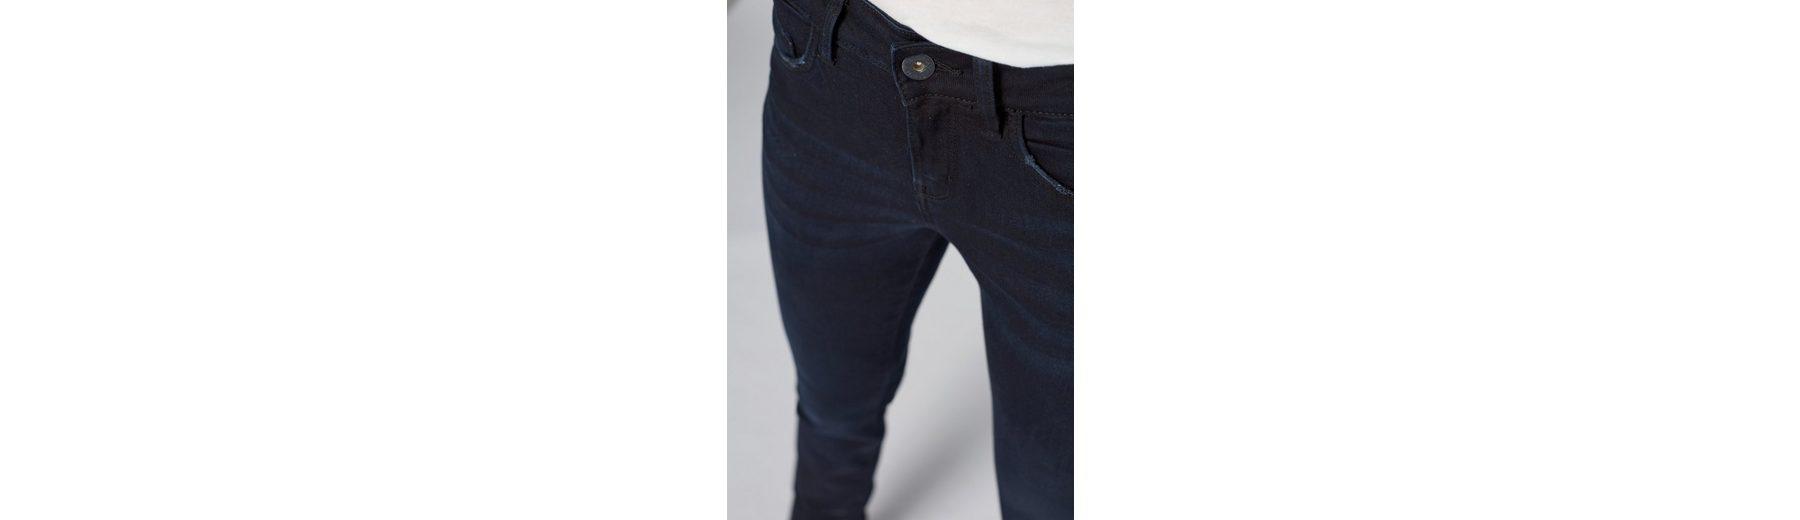 COLORADO DENIM C959 LAYLA Damen Jeans Online-Verkauf Online 0mDMSK